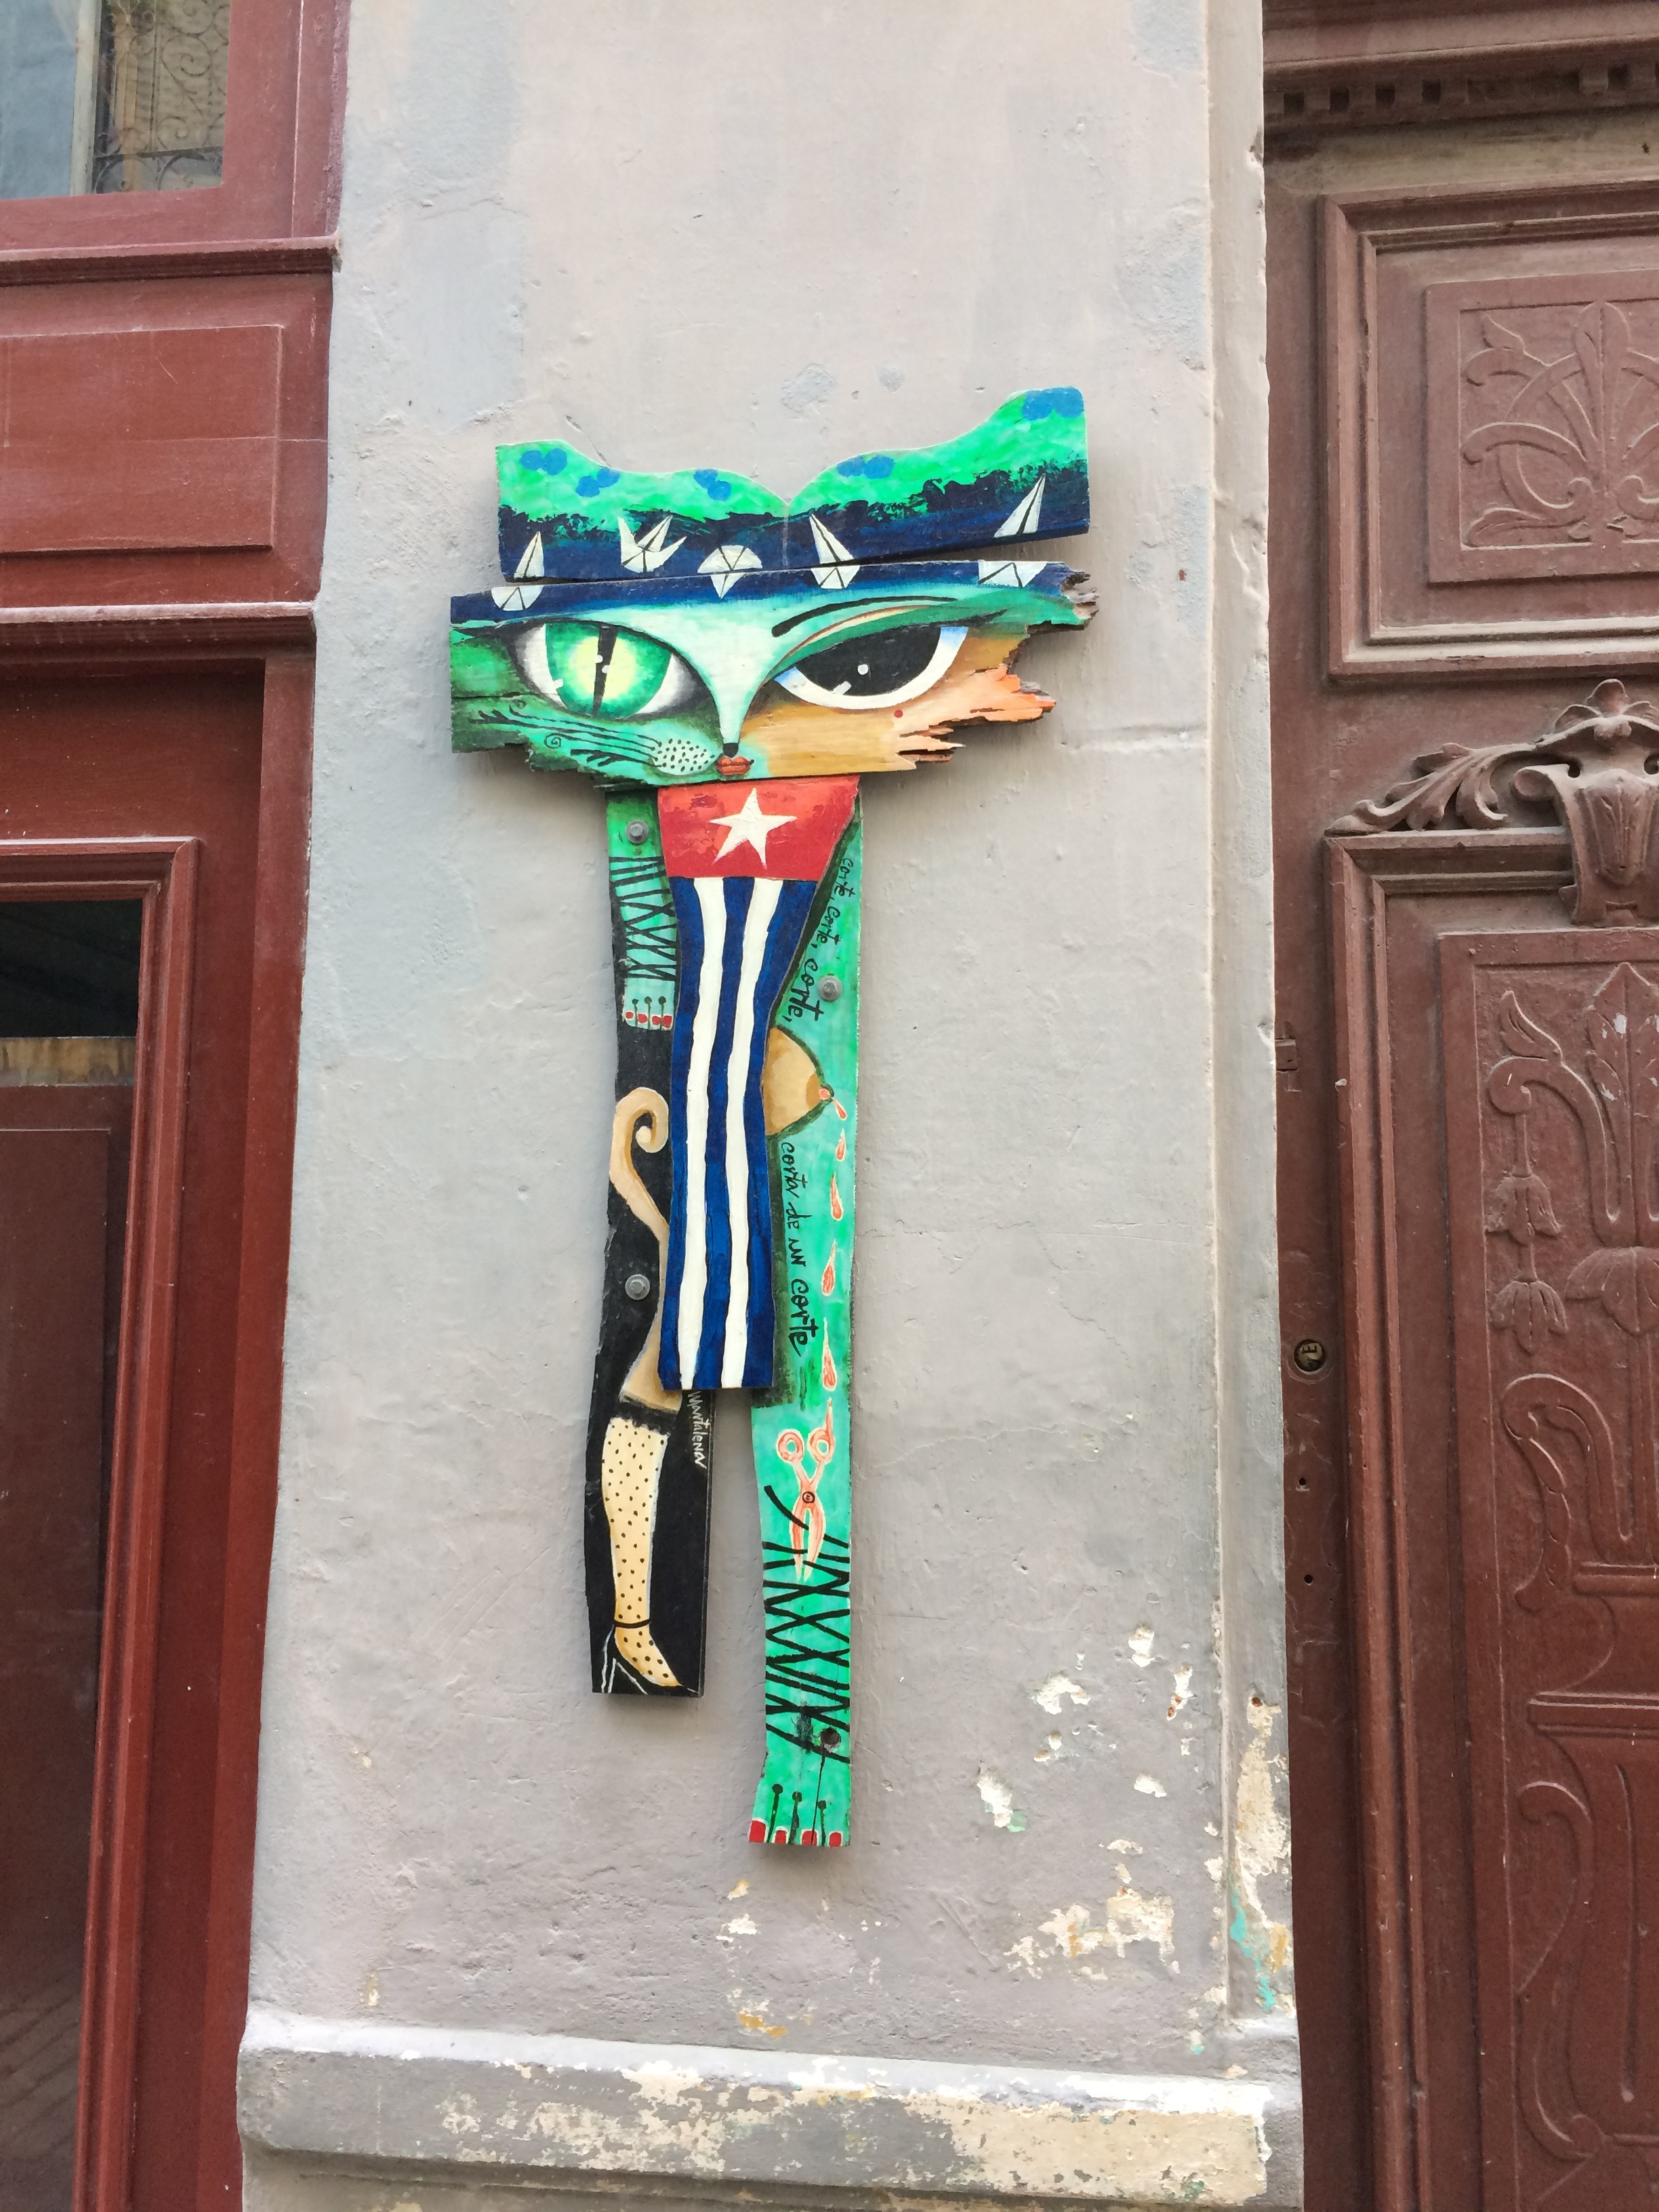 Public art in Old Havana—the barbers' neighborhood